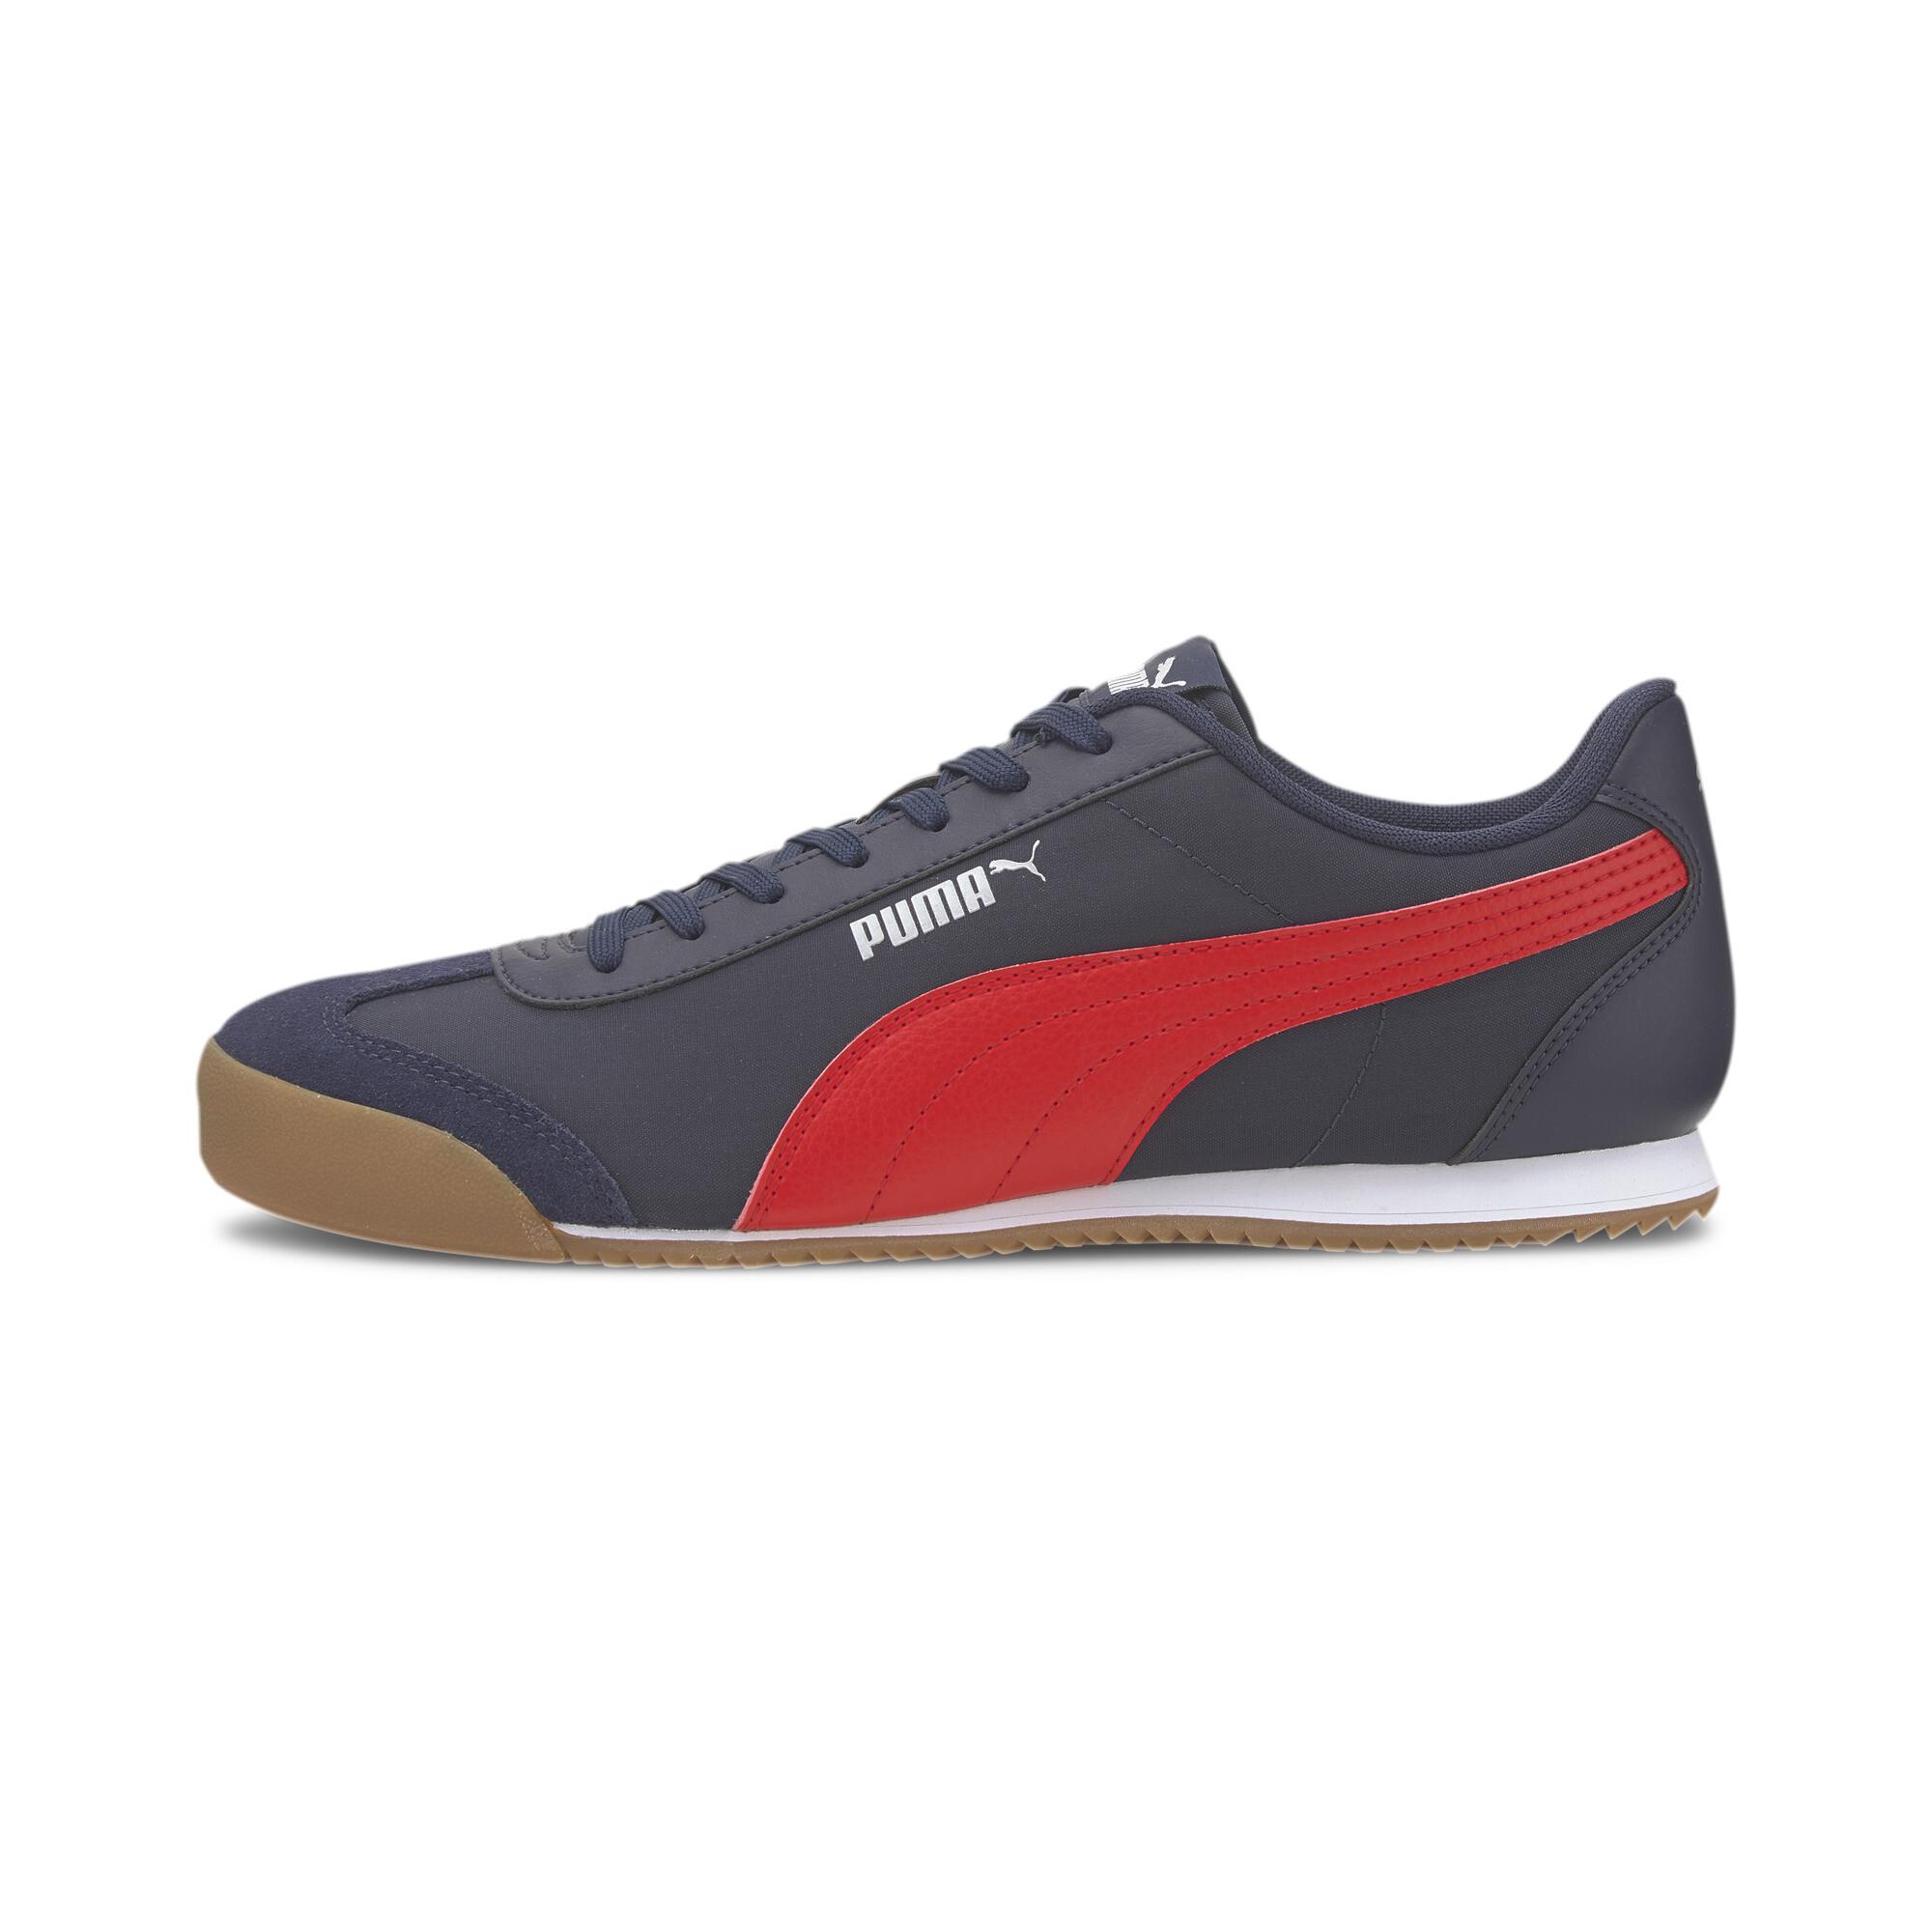 PUMA-Men-039-s-Turino-NL-Sneakers thumbnail 11